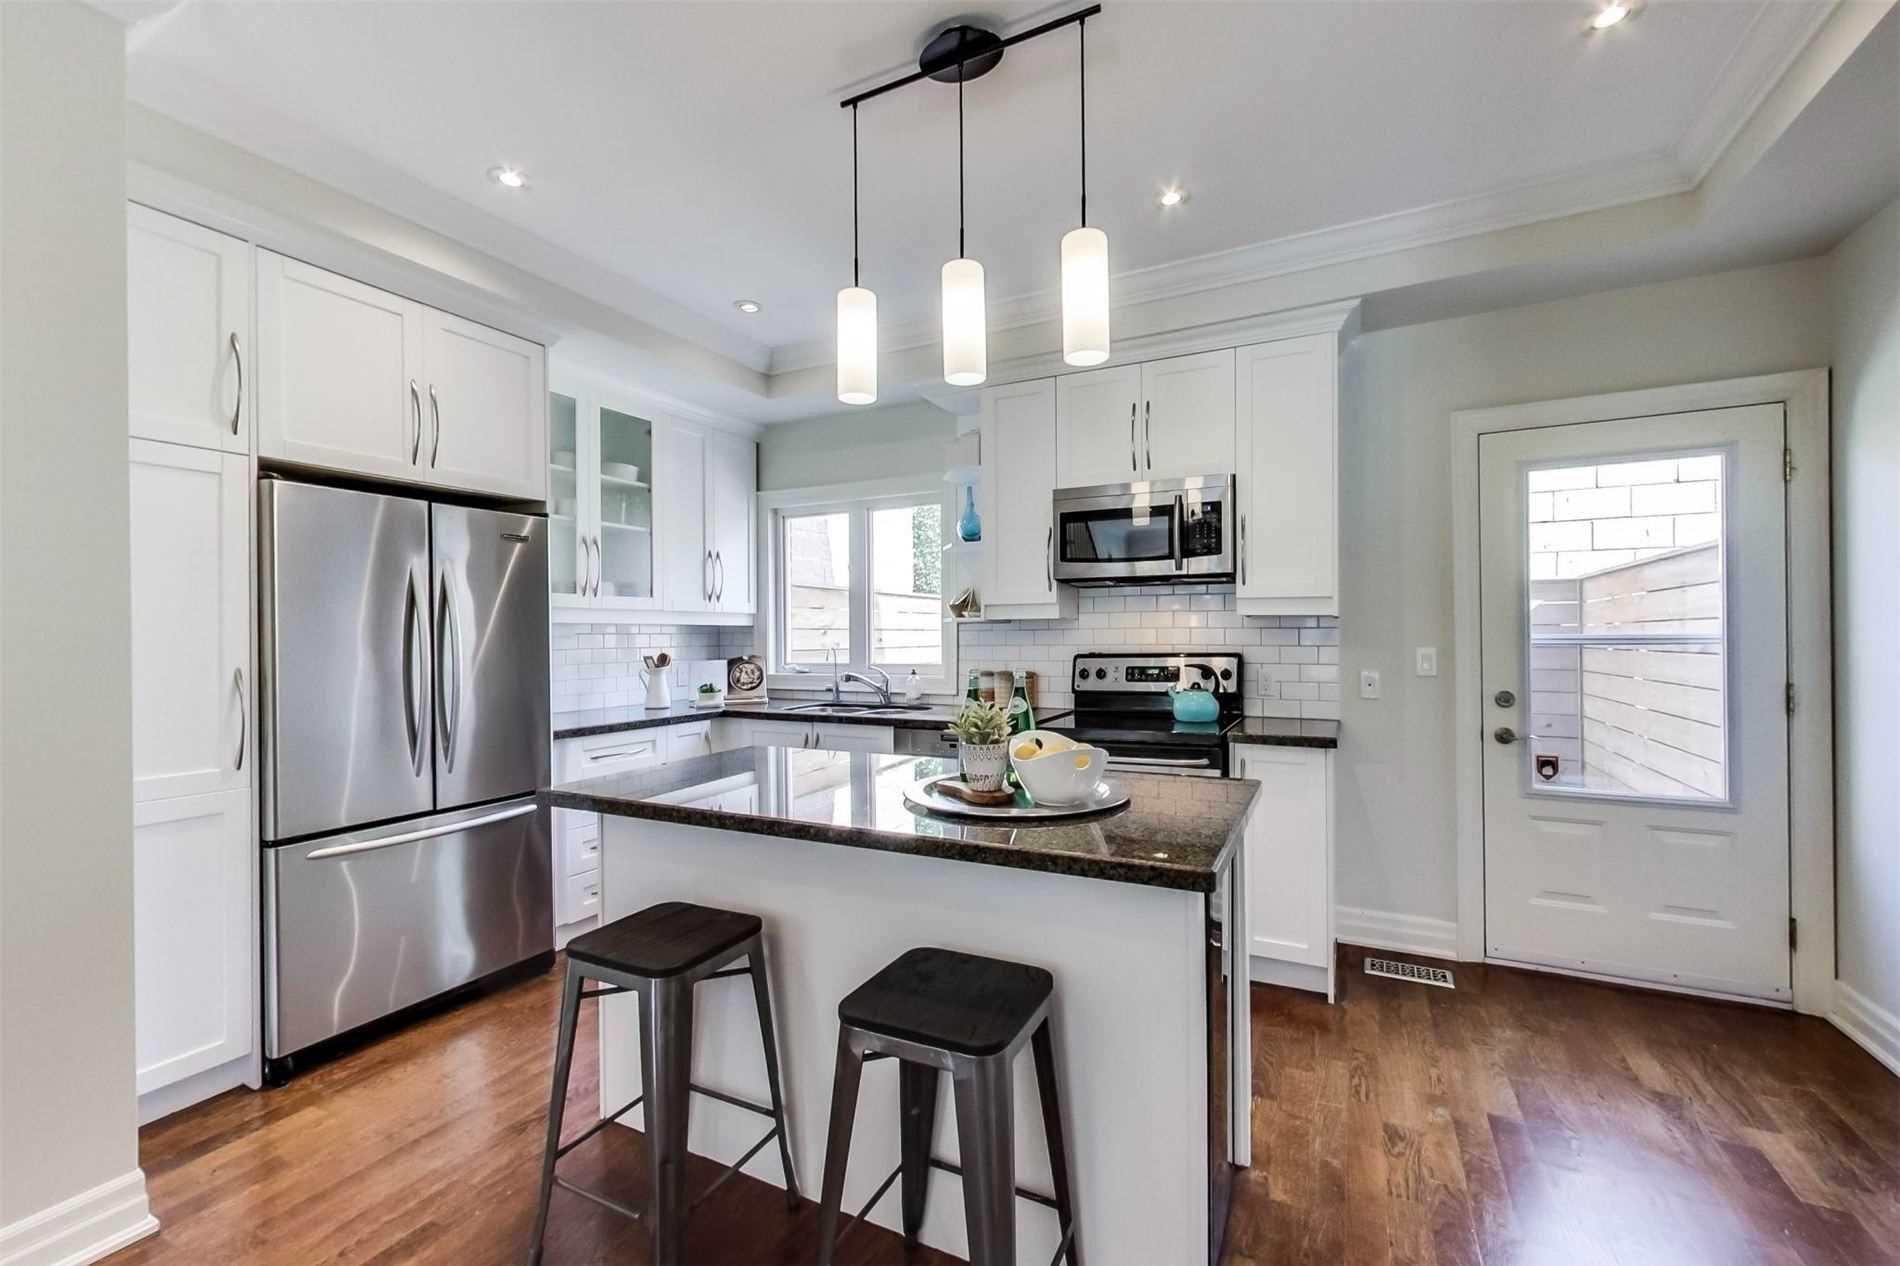 Photo 10: Photos: 213 Heward Avenue in Toronto: South Riverdale House (3-Storey) for sale (Toronto E01)  : MLS®# E4941877